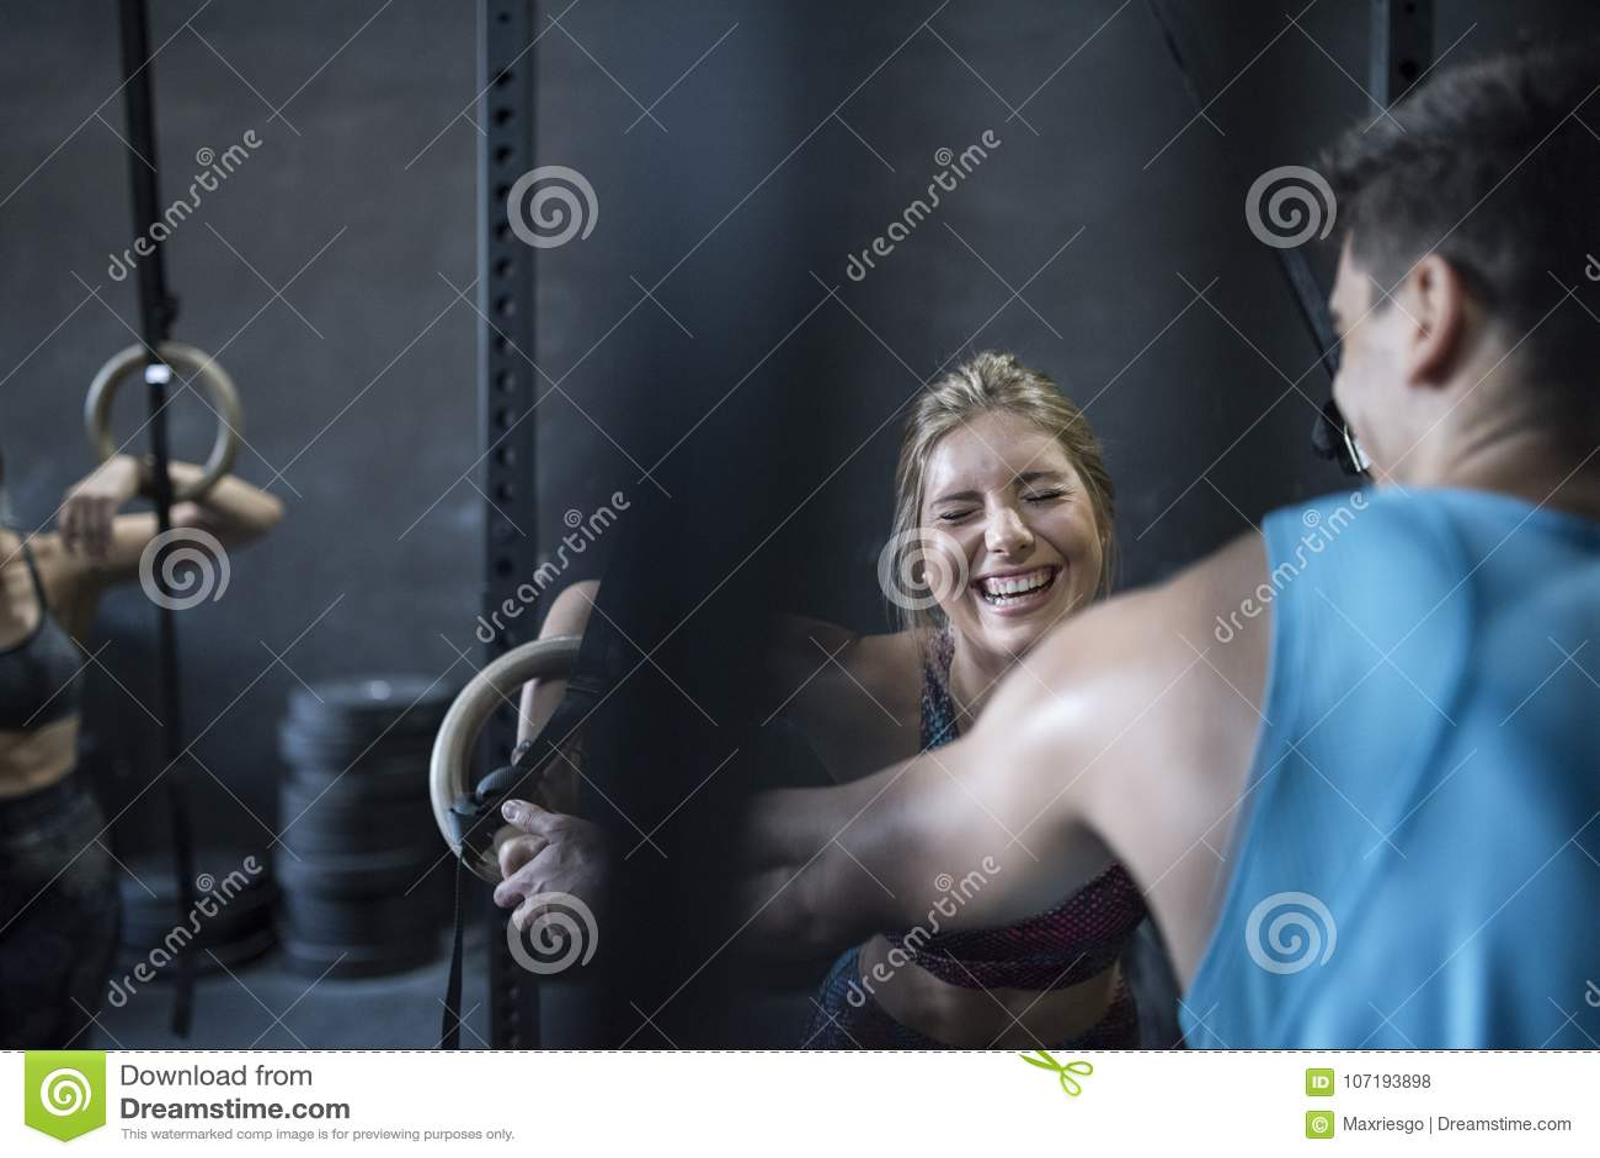 Swinging personal Adult